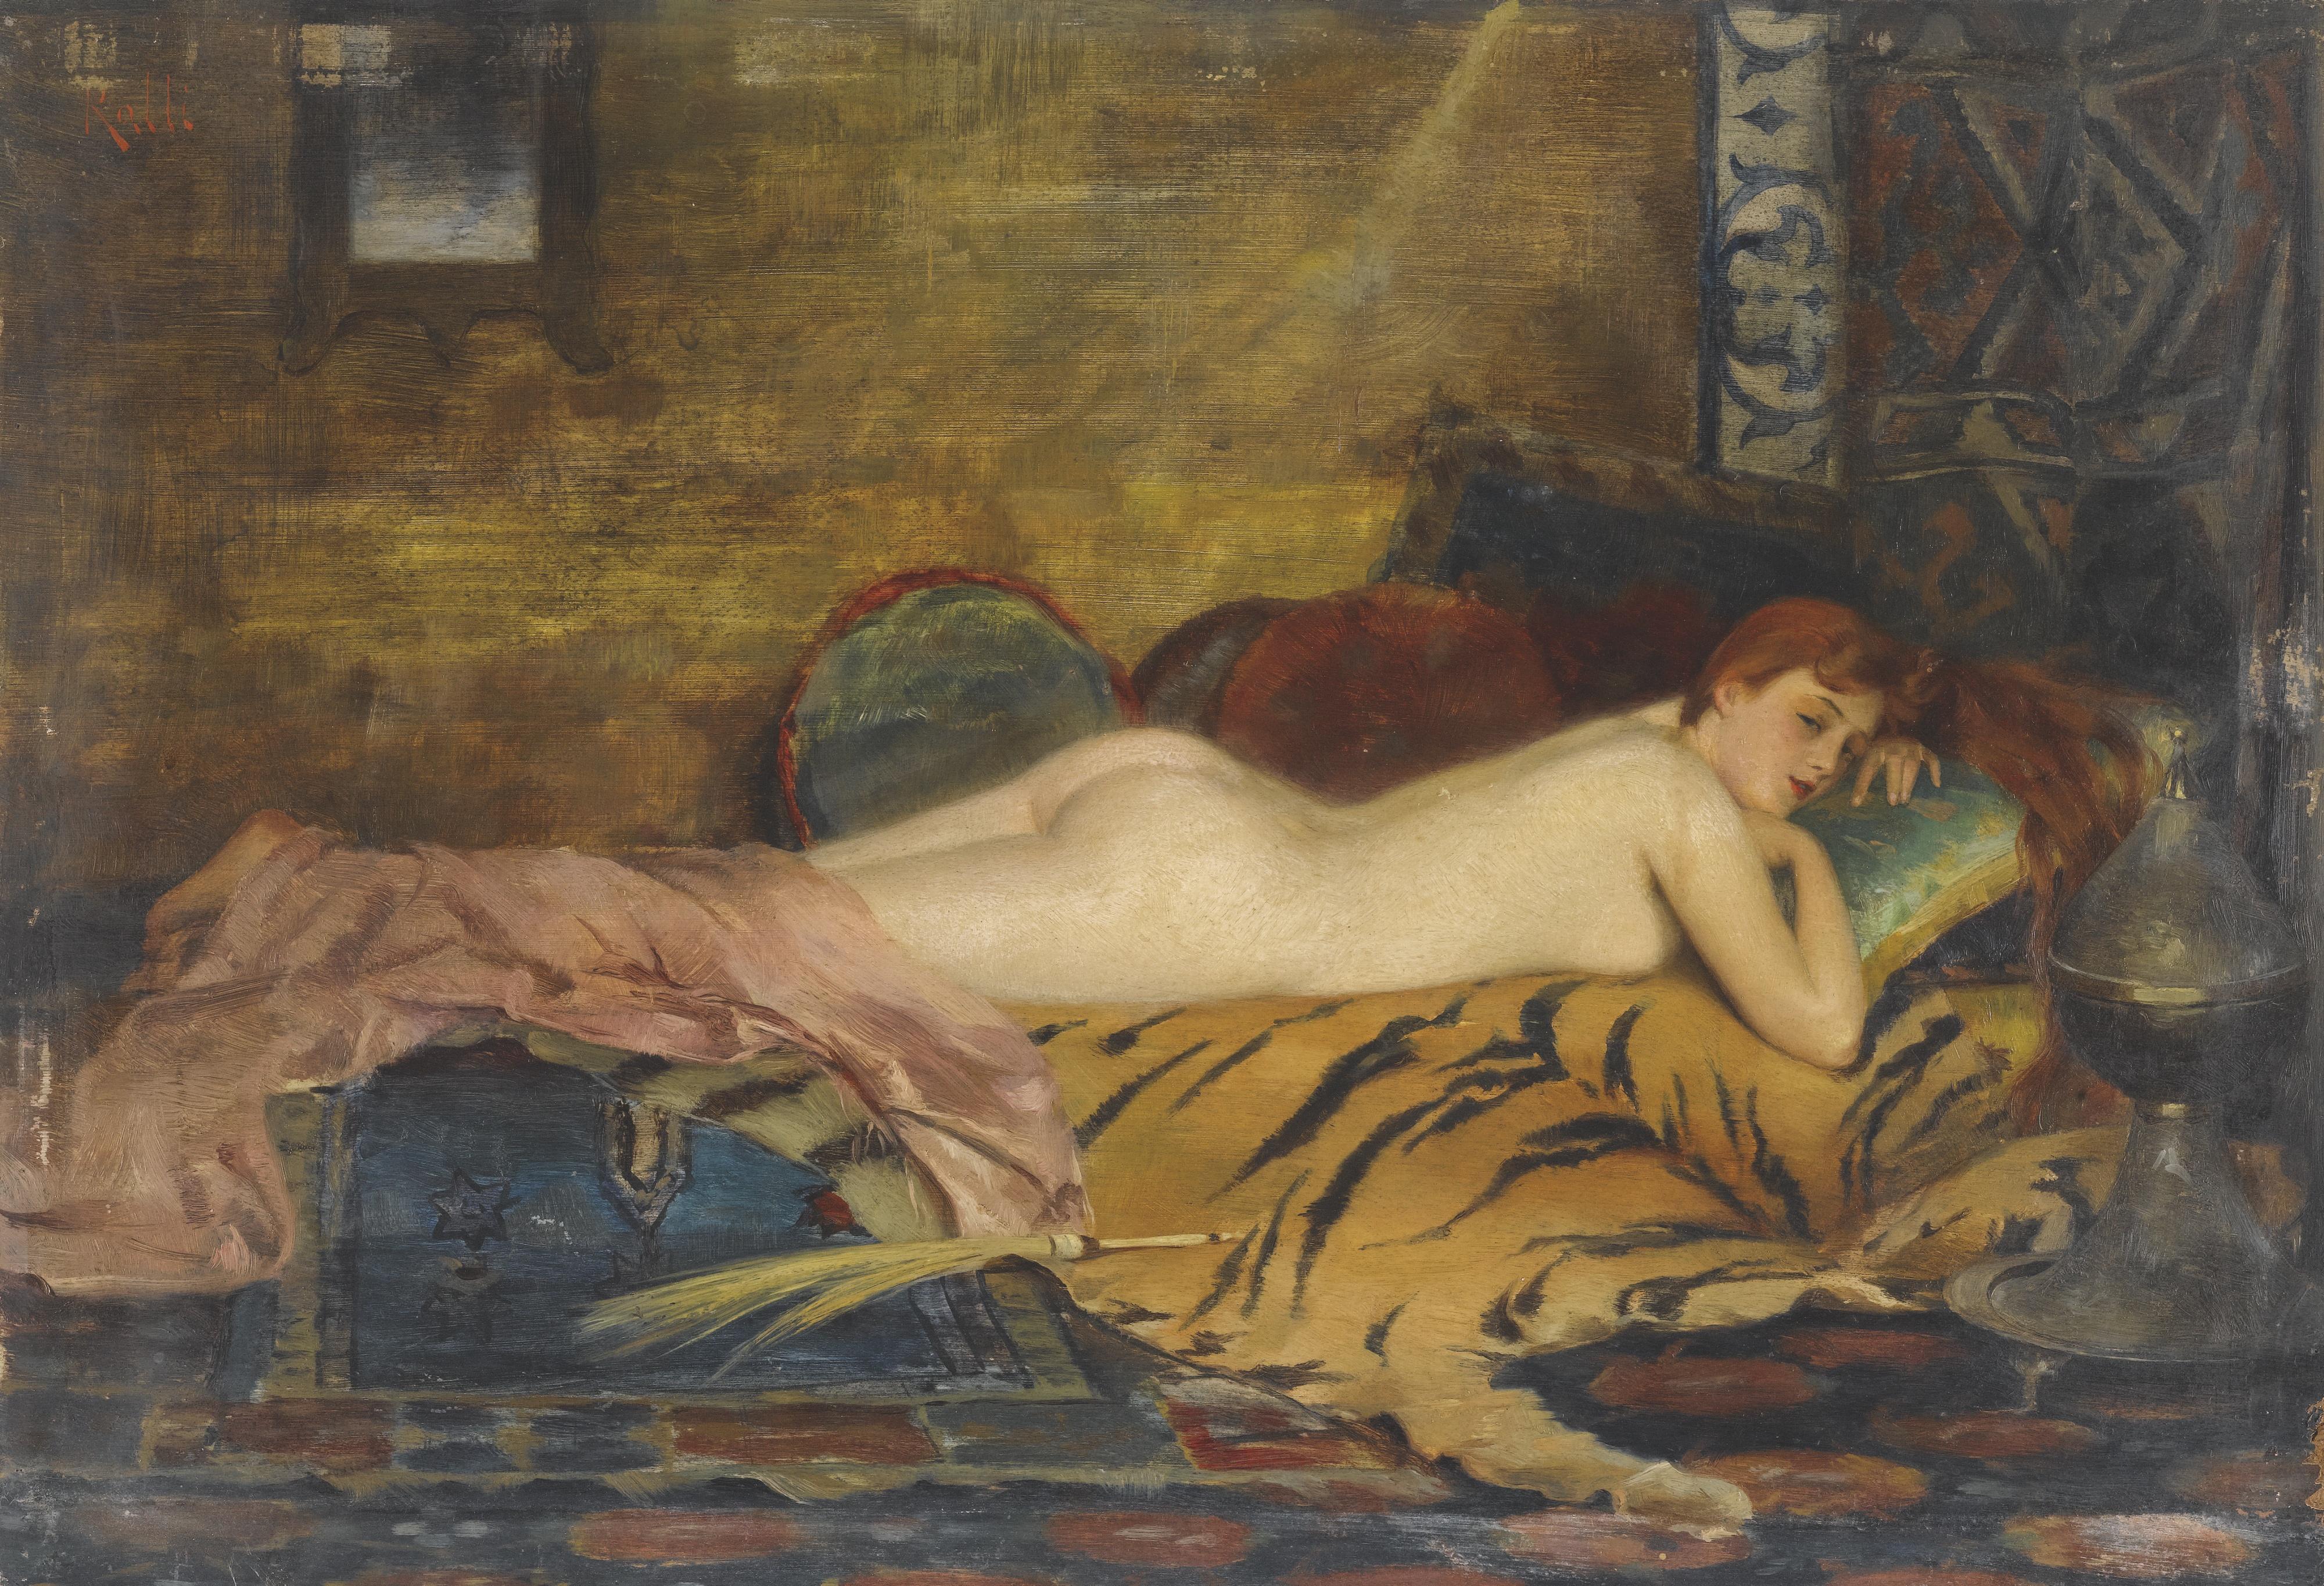 Theodoros Rallis, 1852-1909. 24 х 35 см. Лежащая обнаженная. частная коллекция